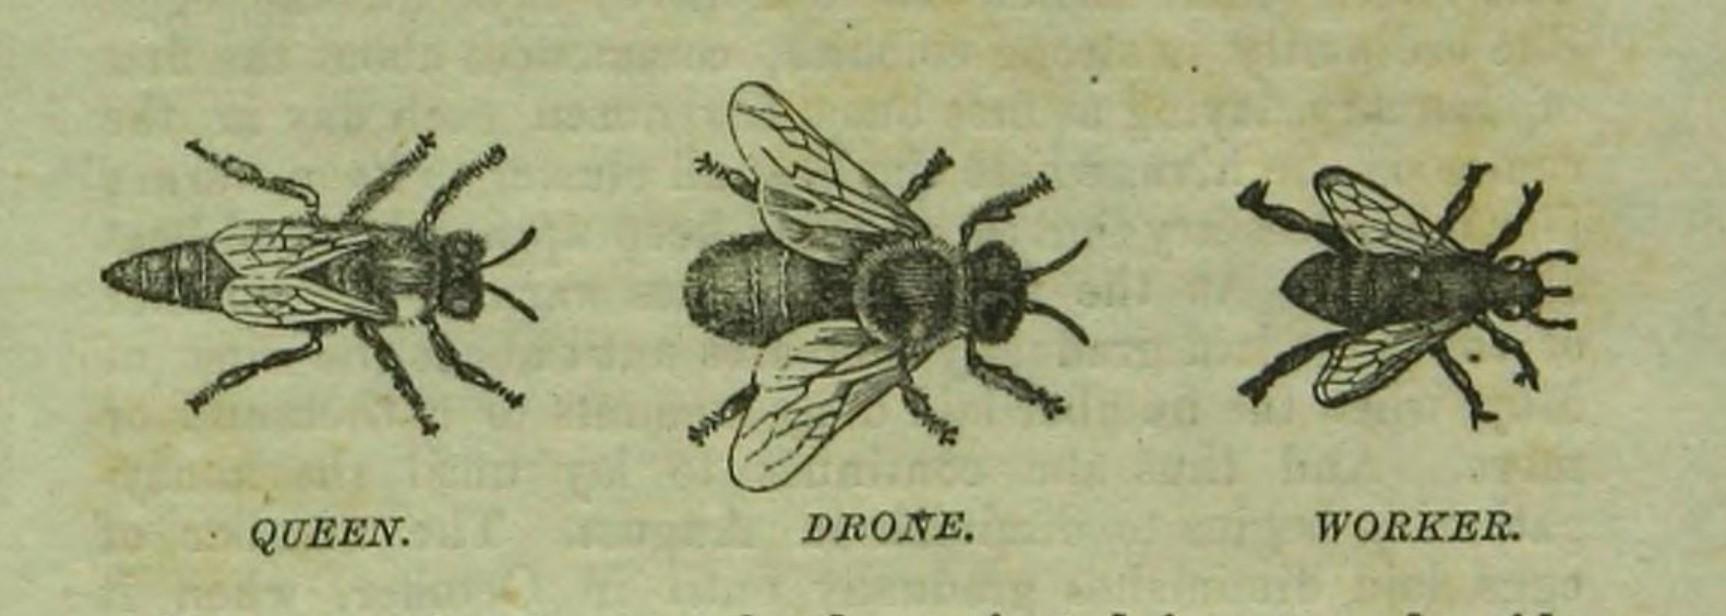 R Wilkin, Handbook in Bee Culture, 1871a